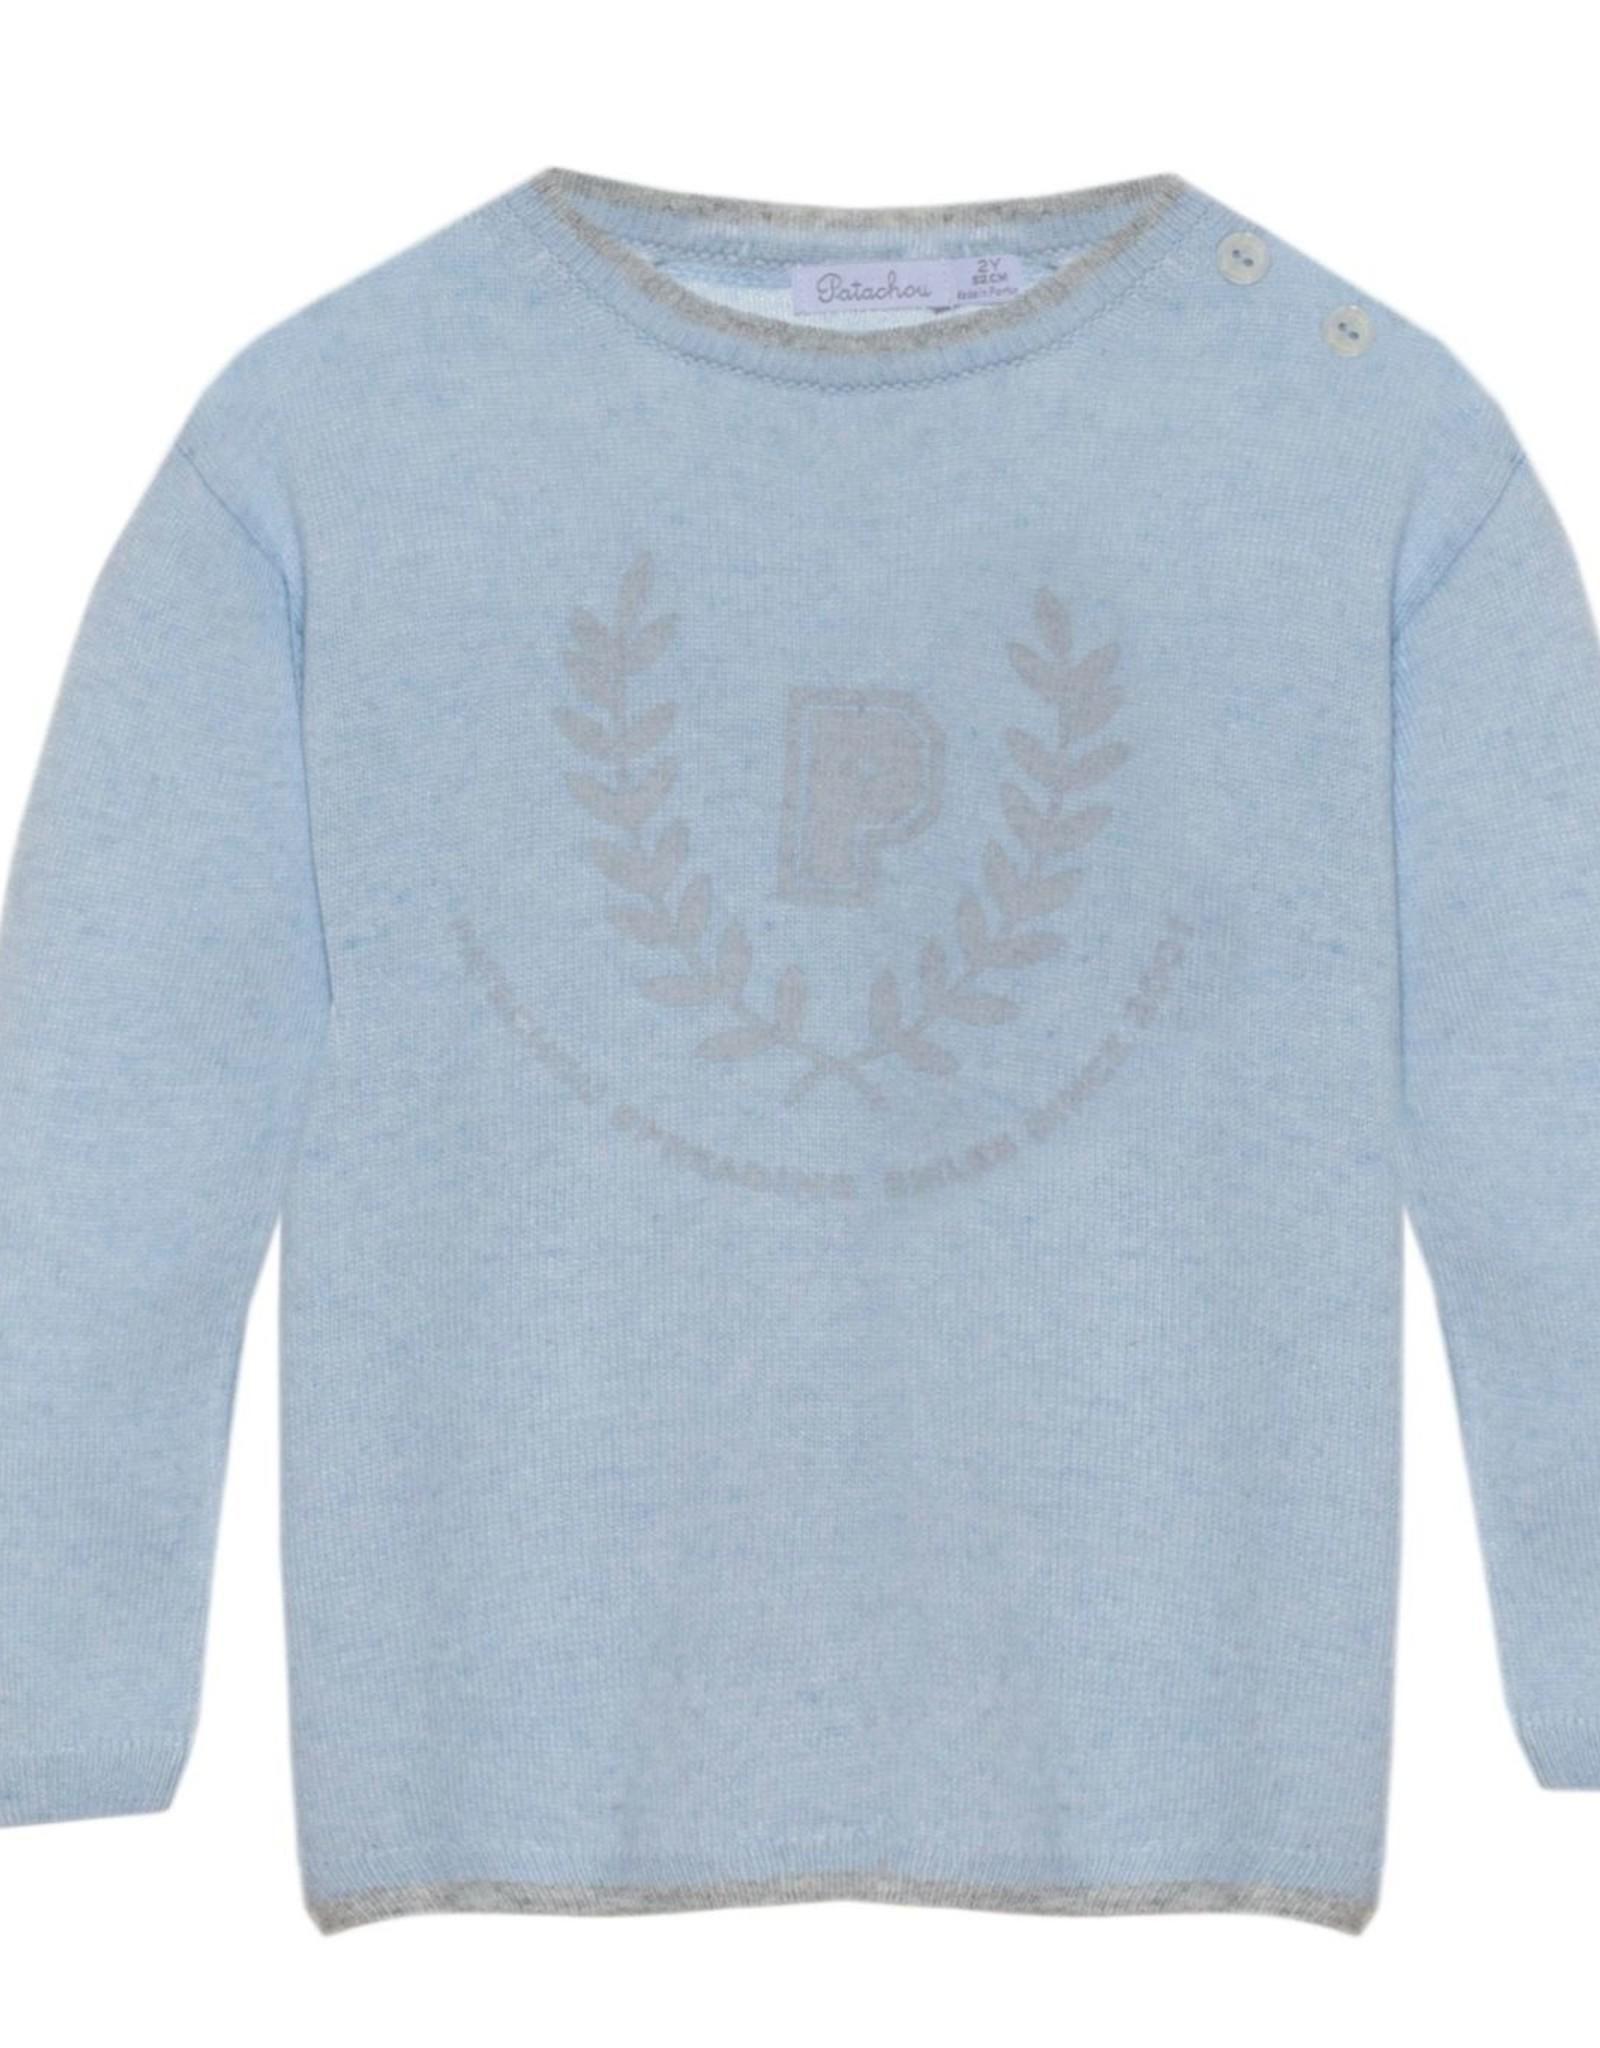 PATACHOU Boy sweater knit blue